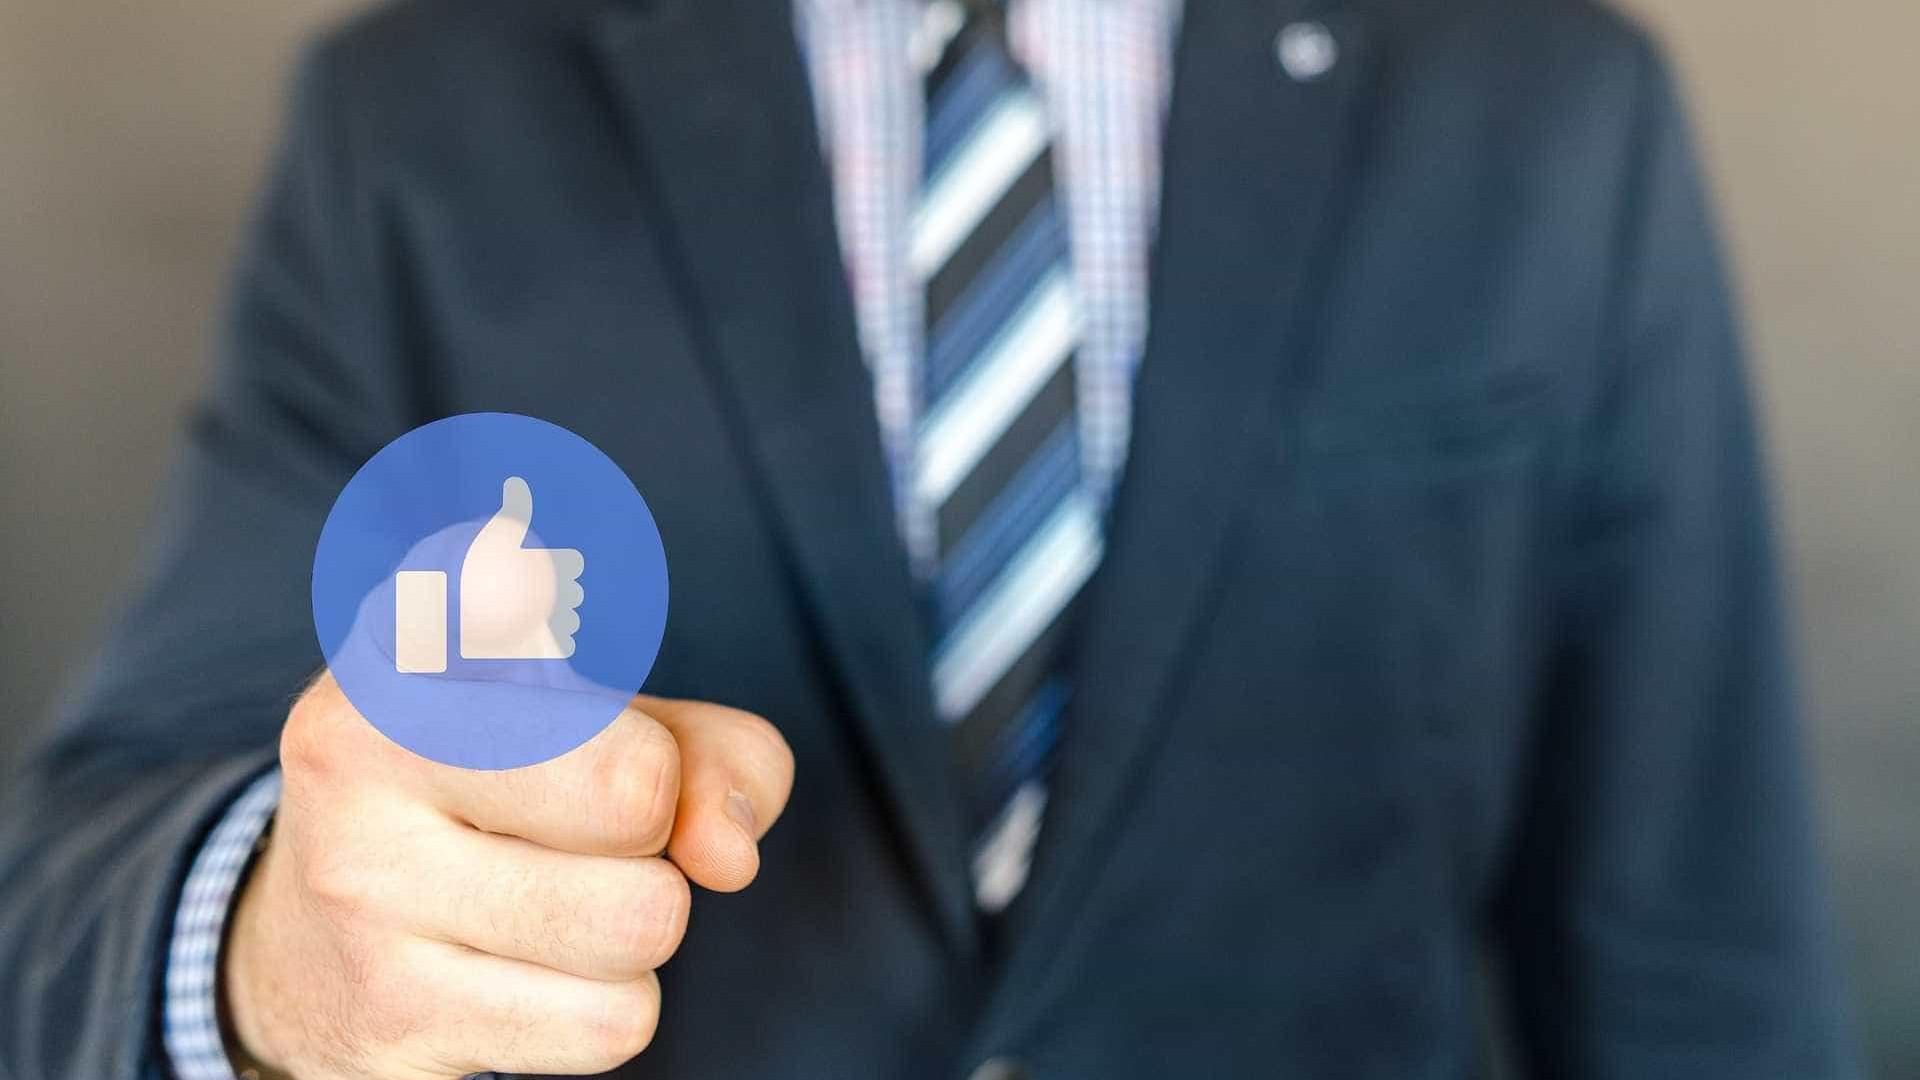 Facebook detalha novas regras contra criminosos e terroristas